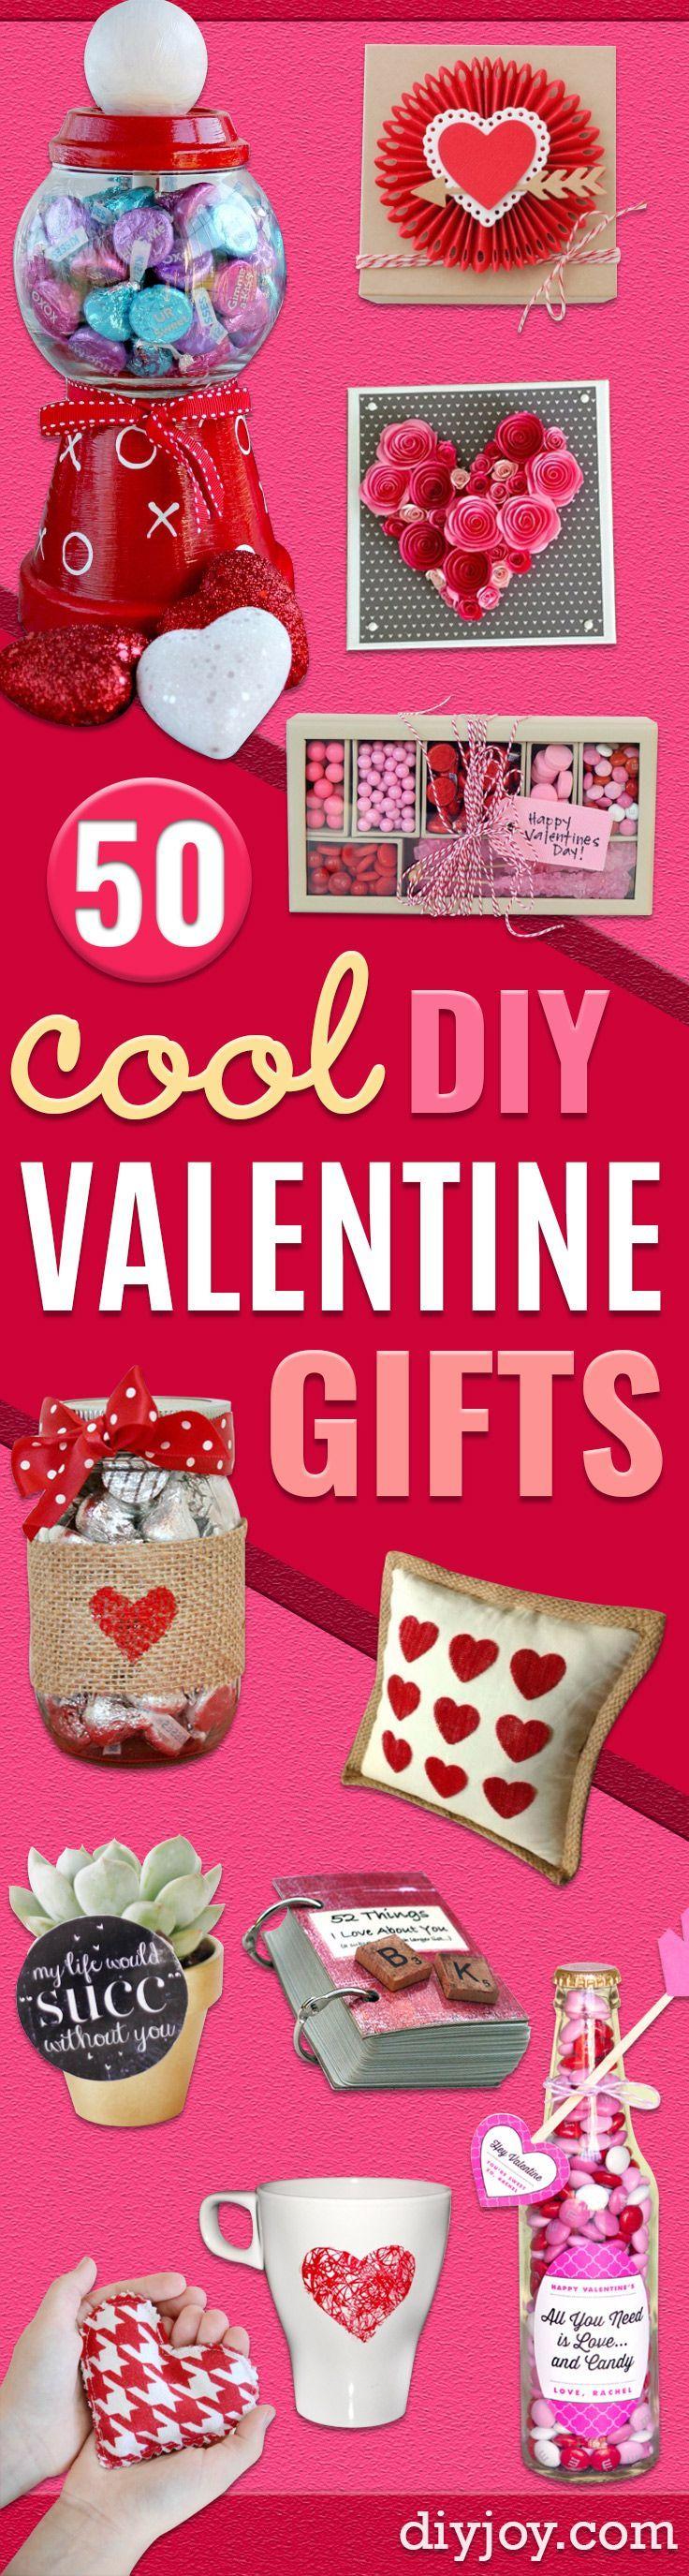 50 Cool Diy Valentine Gifts